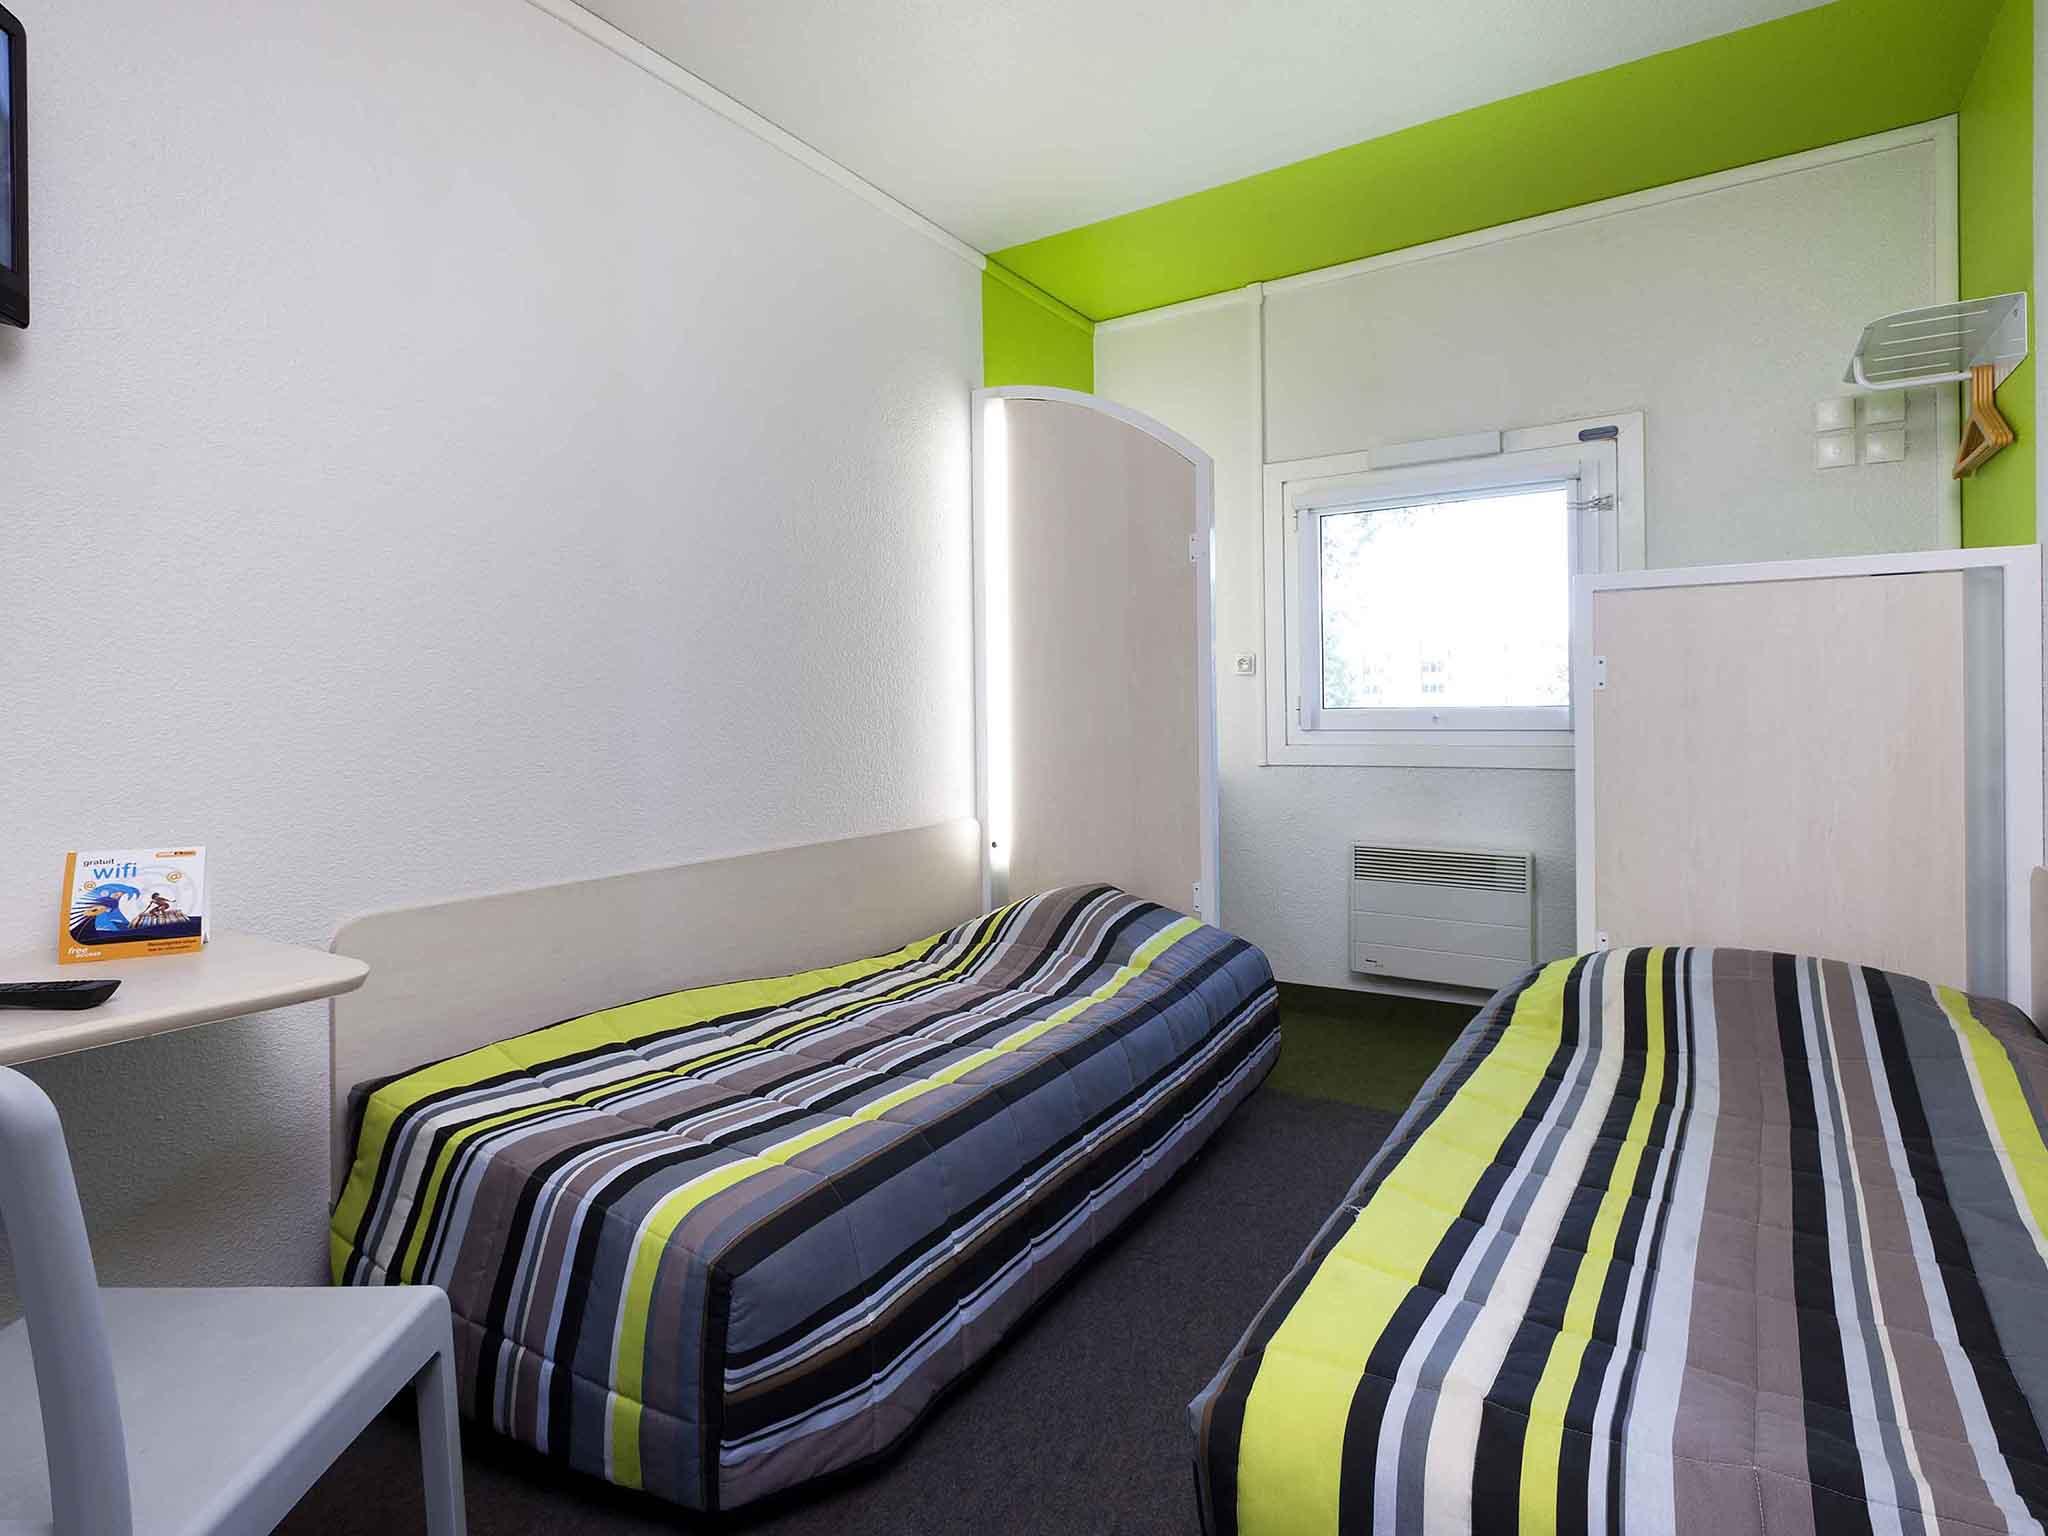 酒店 – hotelF1 Valenciennes Douchy-les-Mines